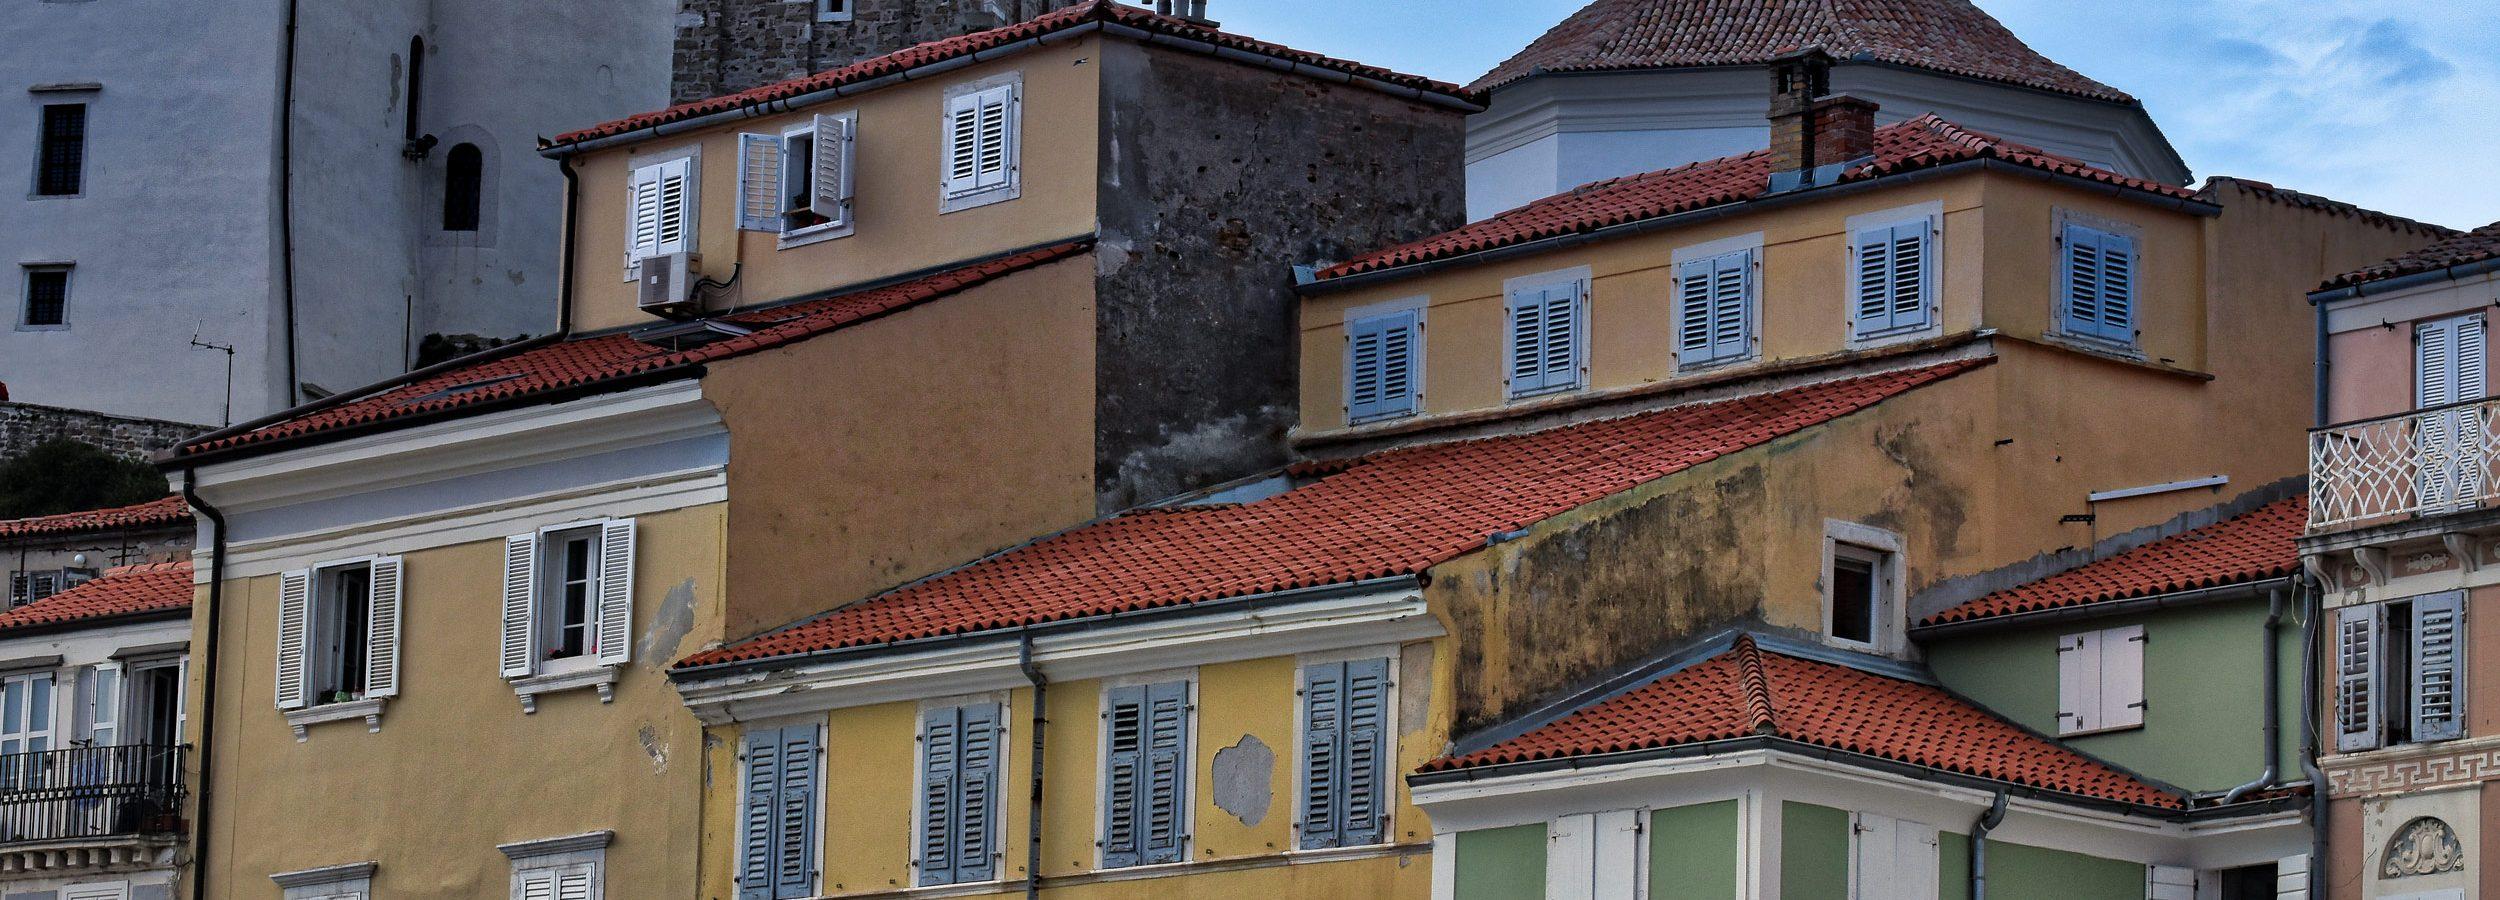 Piran / Pirano, Słowenia